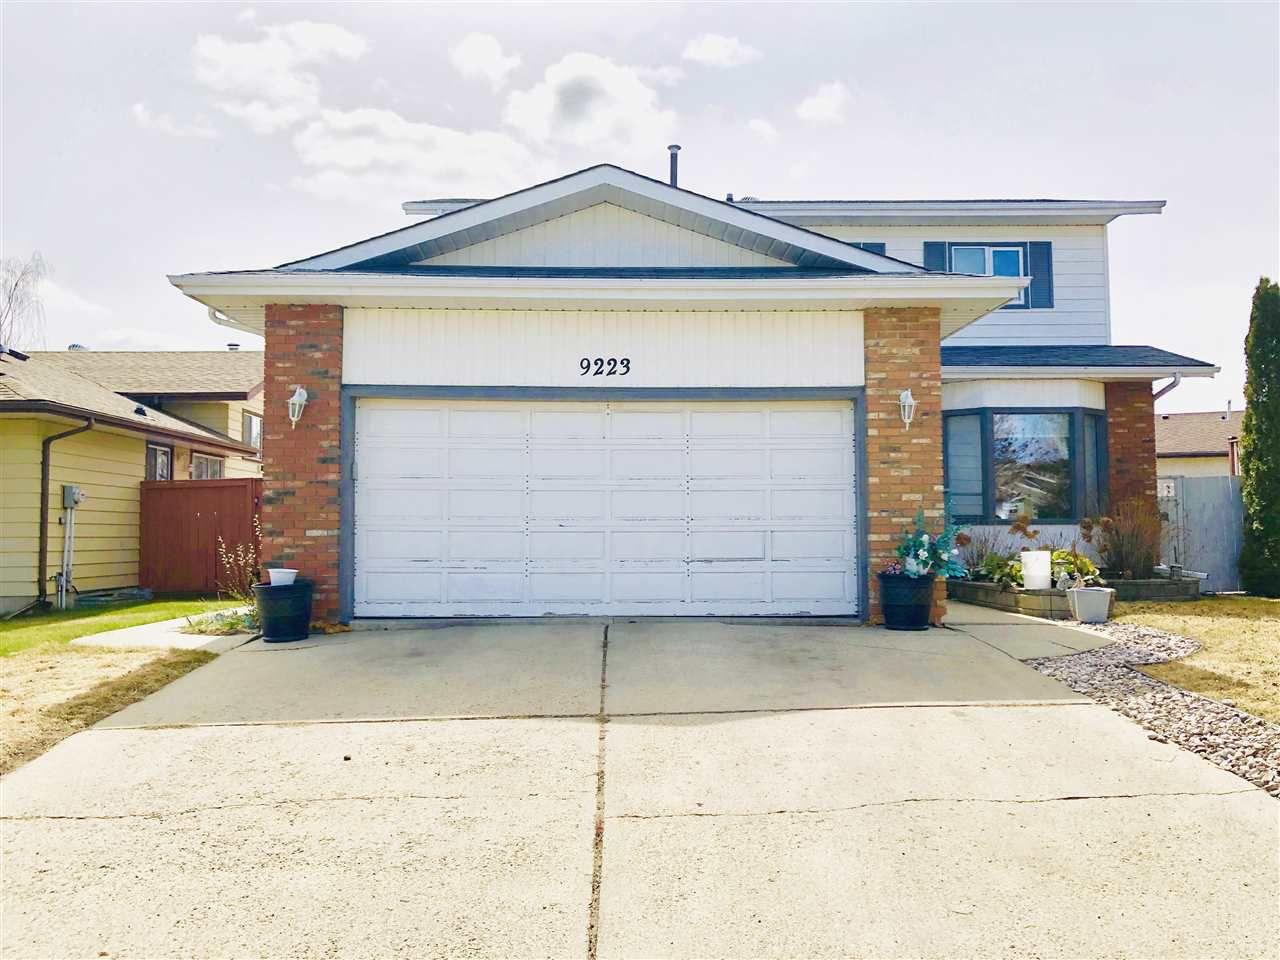 Main Photo: 9223 171 Avenue in Edmonton: Zone 28 House for sale : MLS®# E4155936